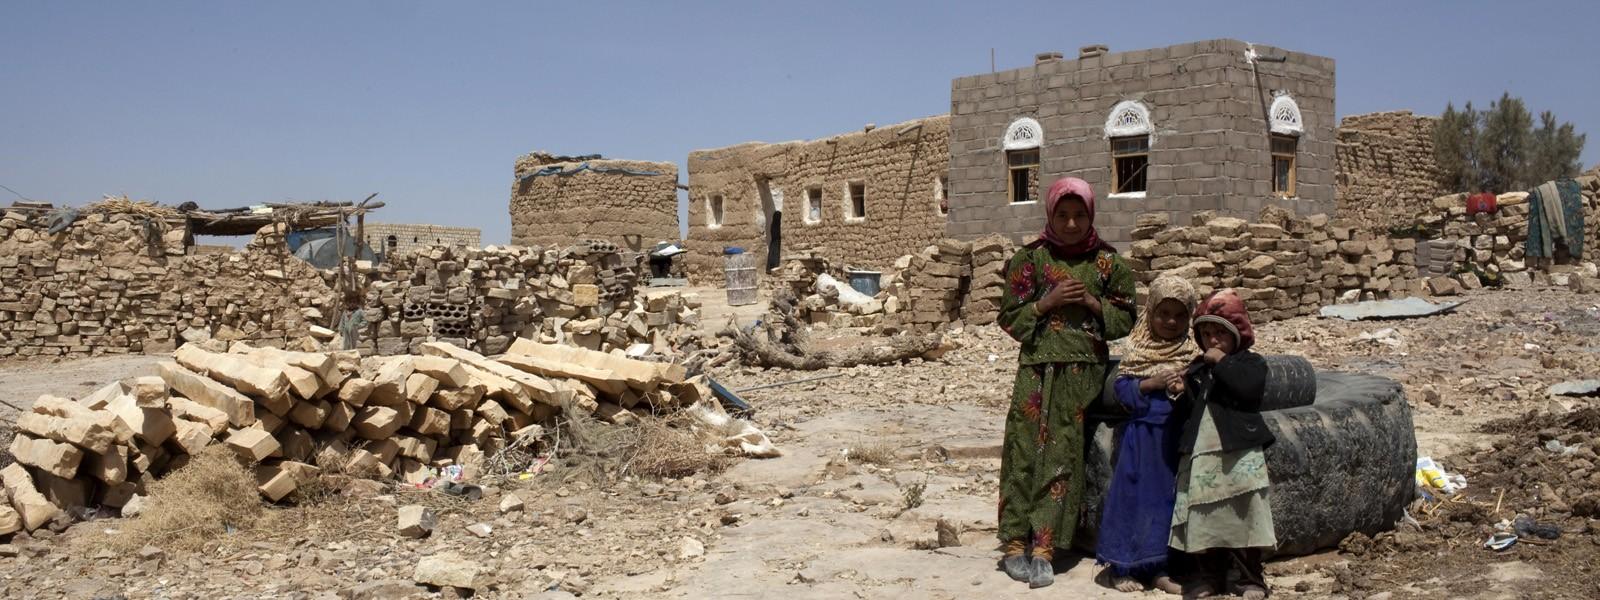 Krise im Jemen